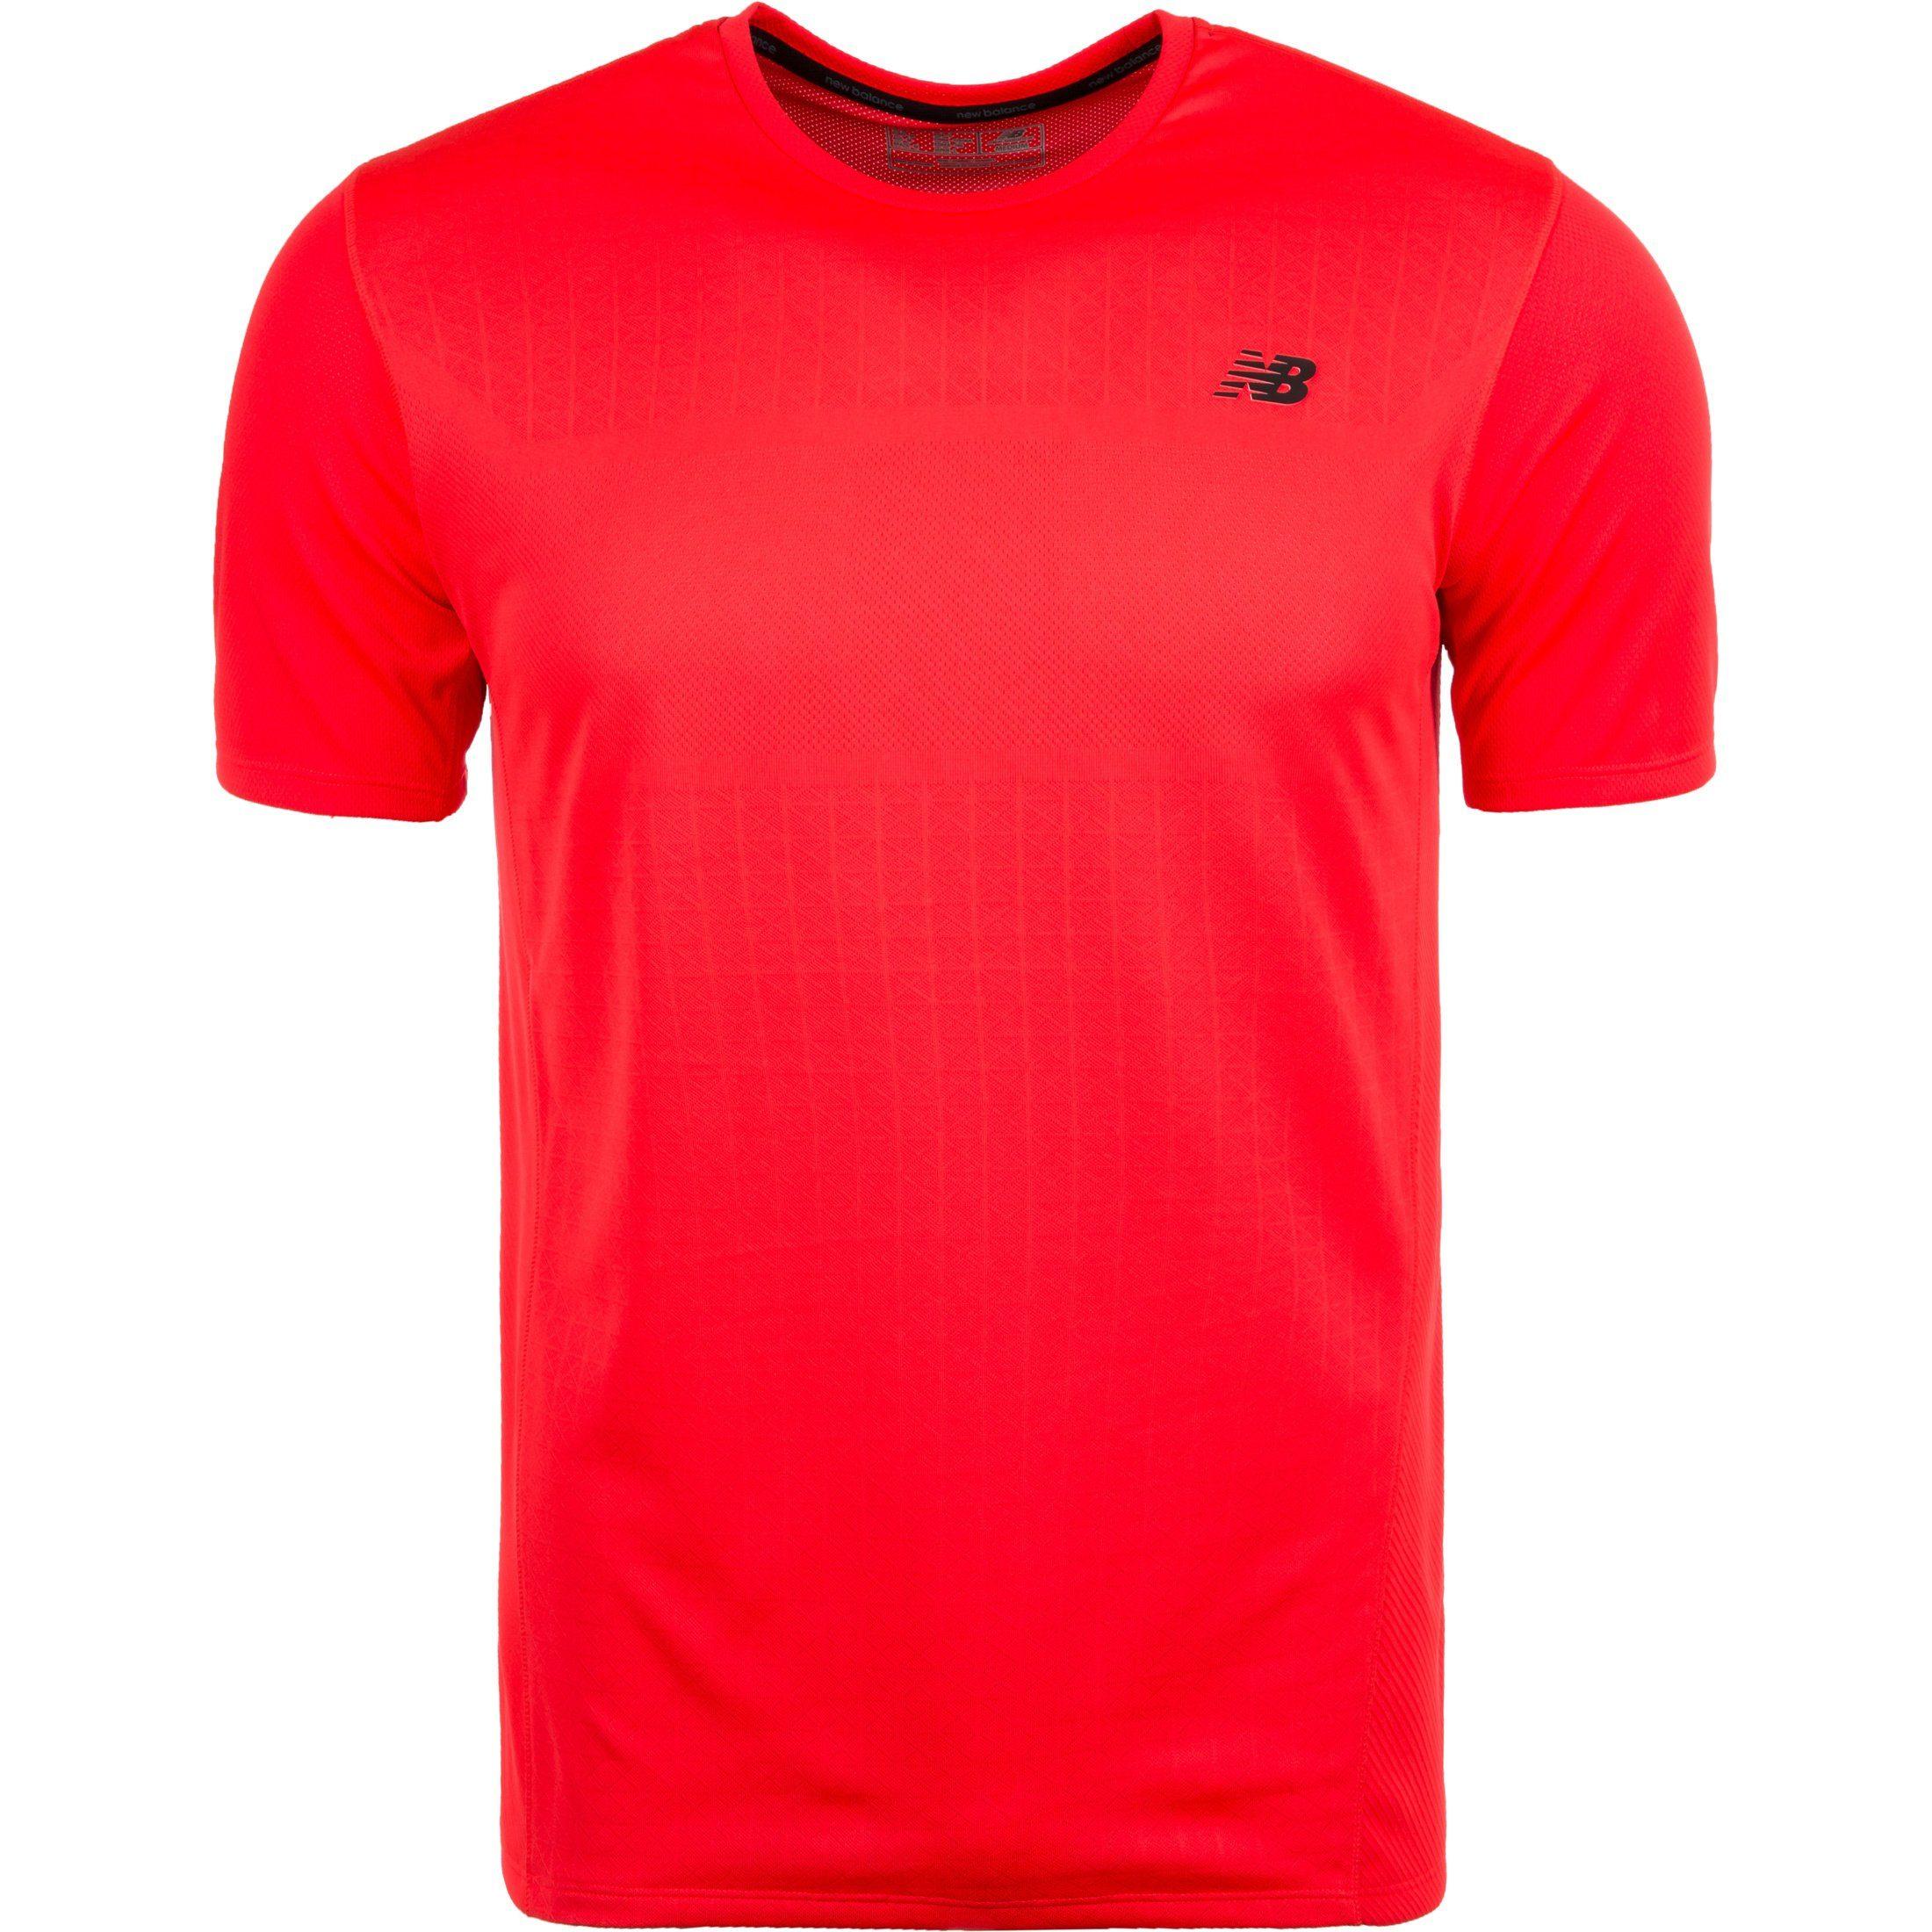 New Balance Trainingsshirt Max Intensity | Sportbekleidung > Sportshirts | New Balance